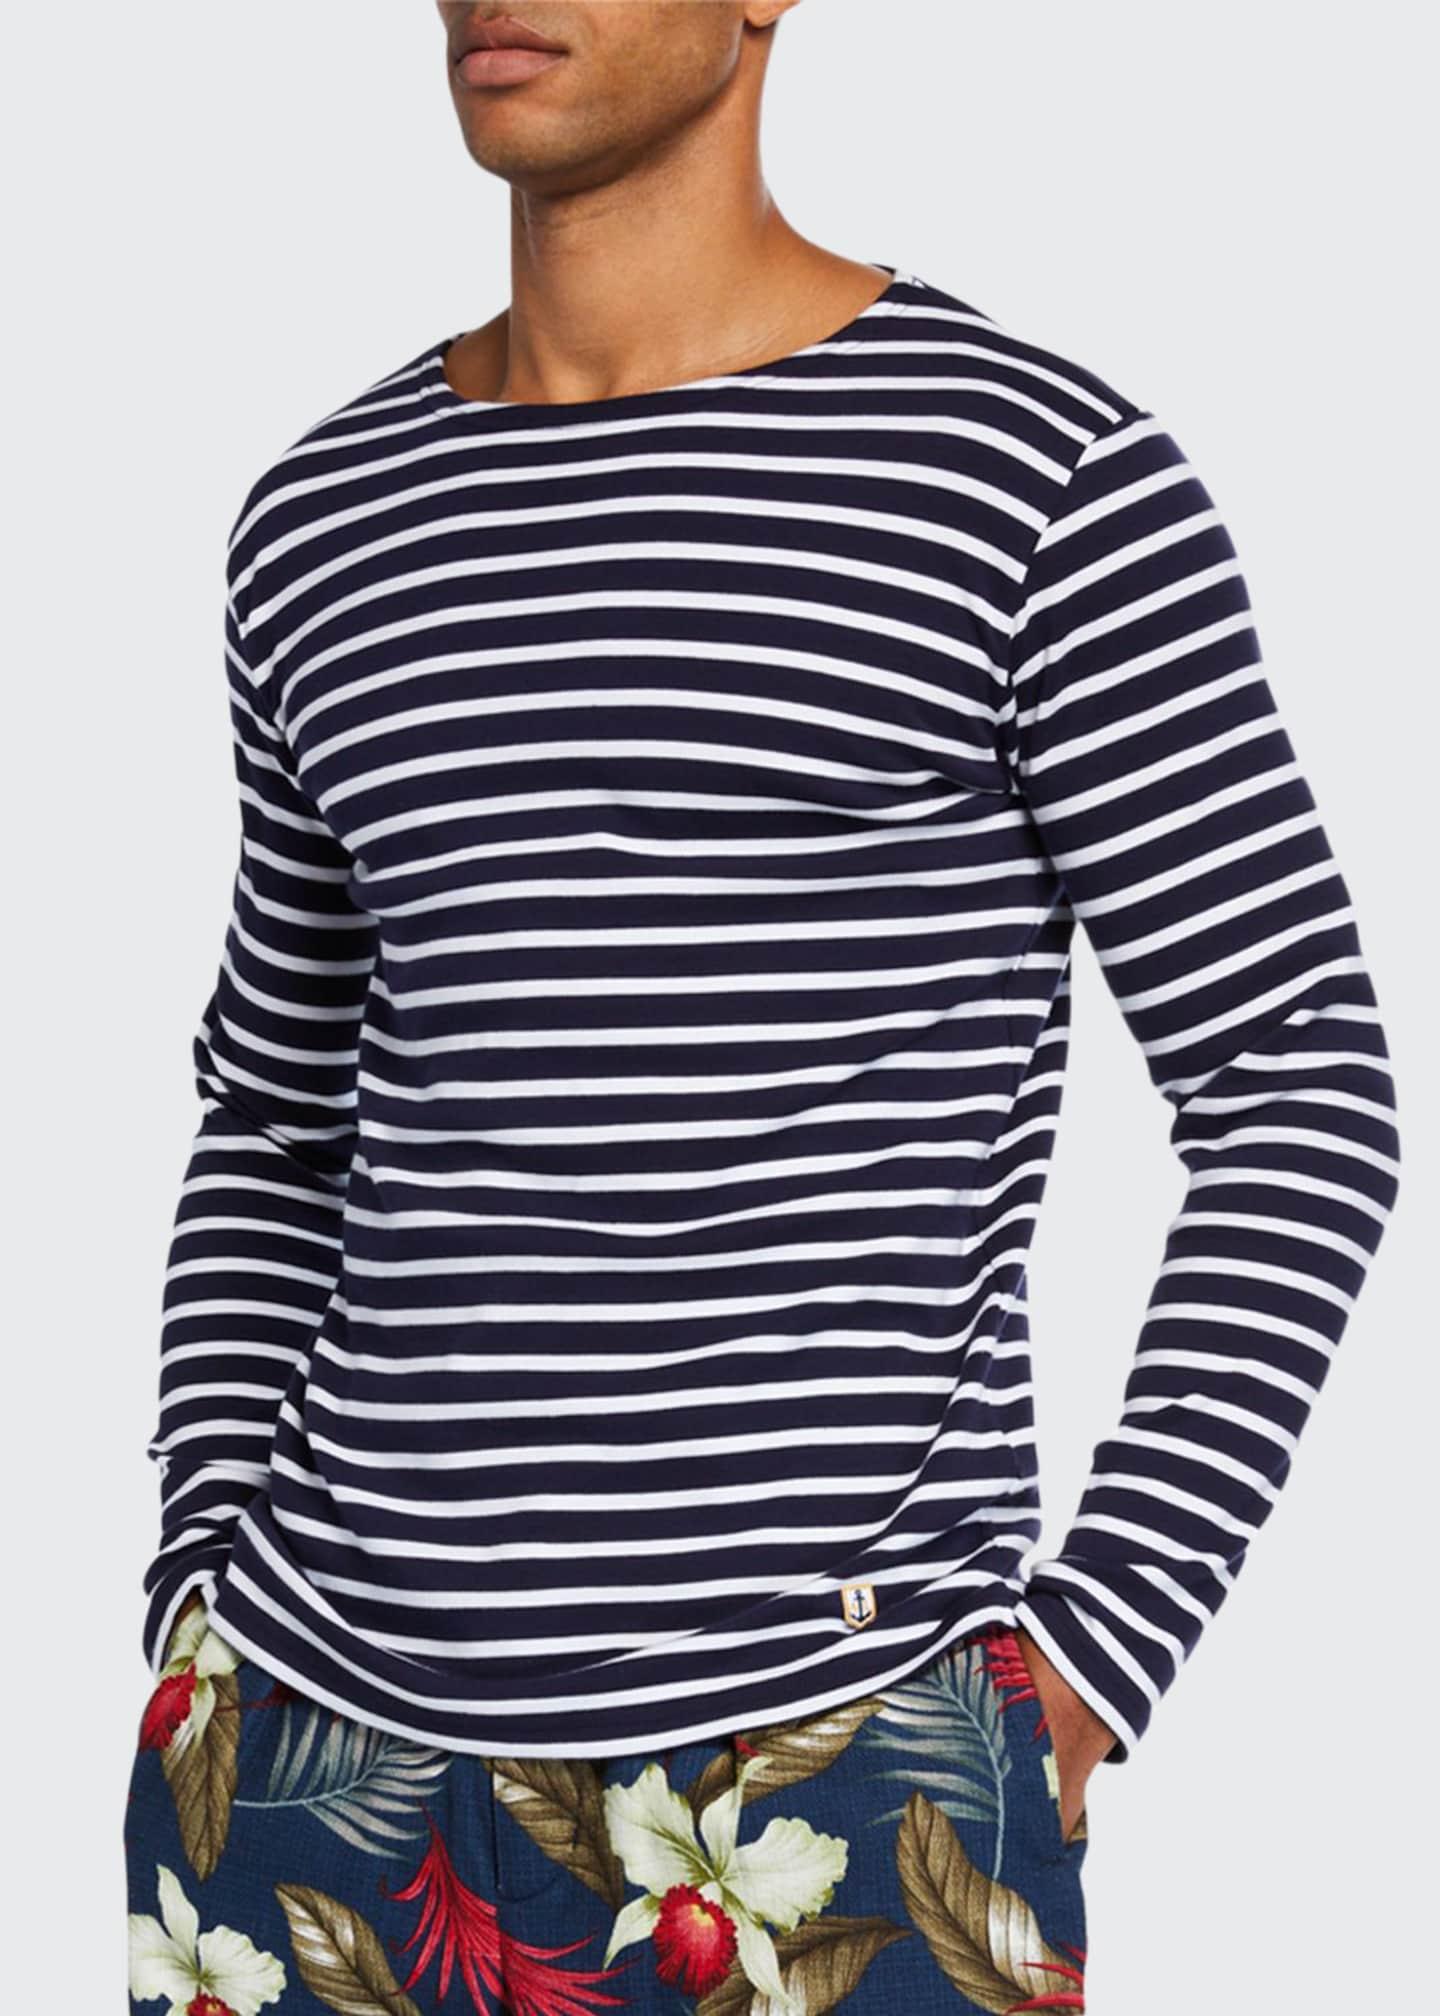 Armor Lux Men's Marinire Heritage Striped Long-Sleeve T-Shirt